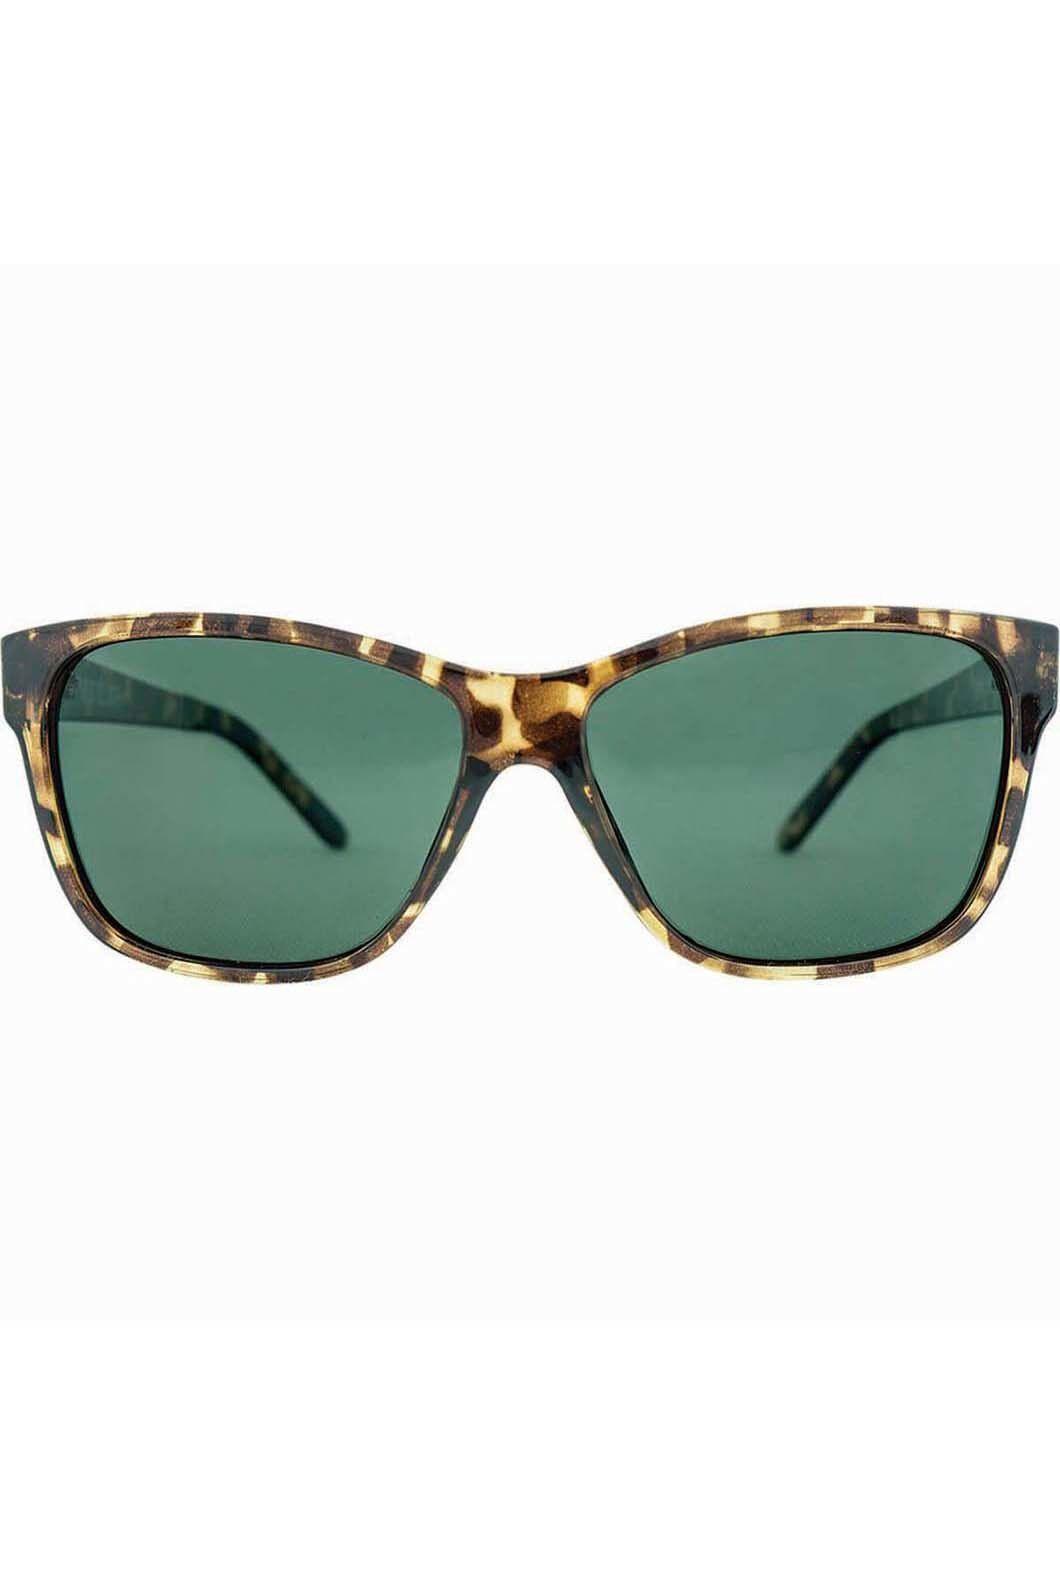 Venture Eyewear Womens Oahu Sunglasses, DEMI/G15, hi-res